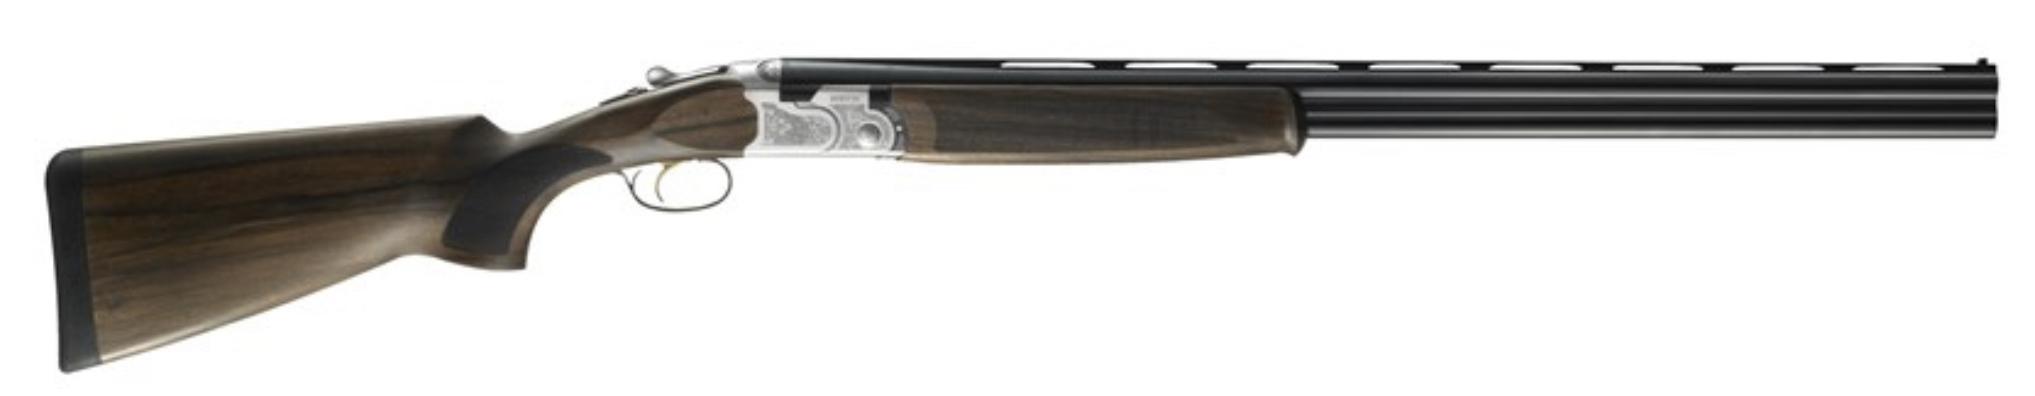 Beretta 686 Sporting